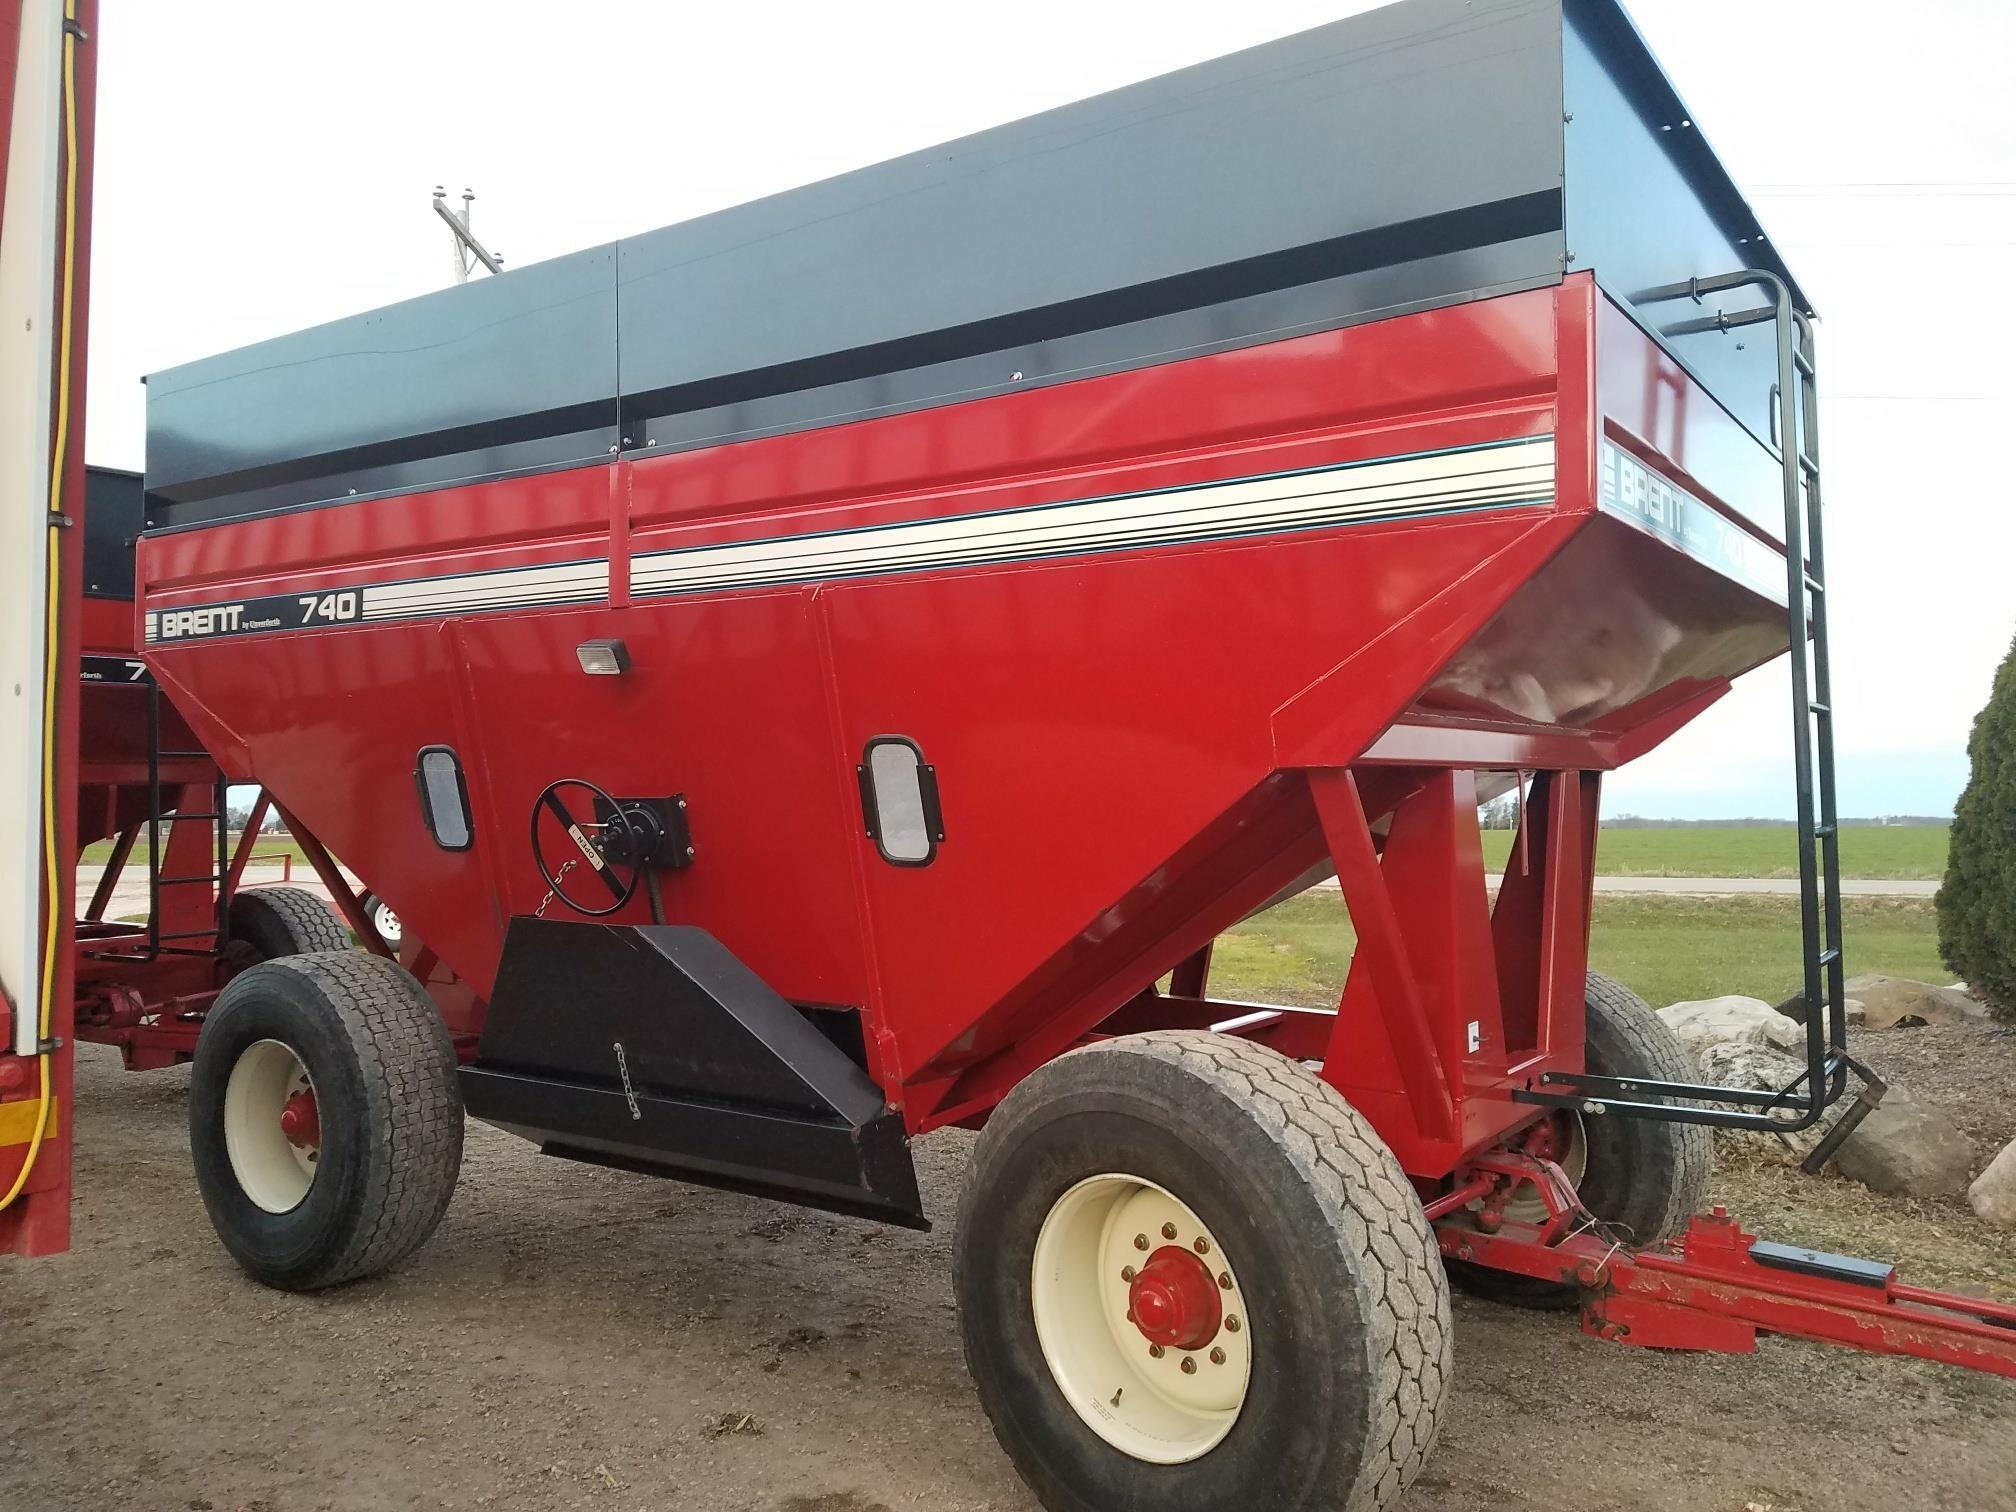 2004 Brent GT740 Gravity Wagon